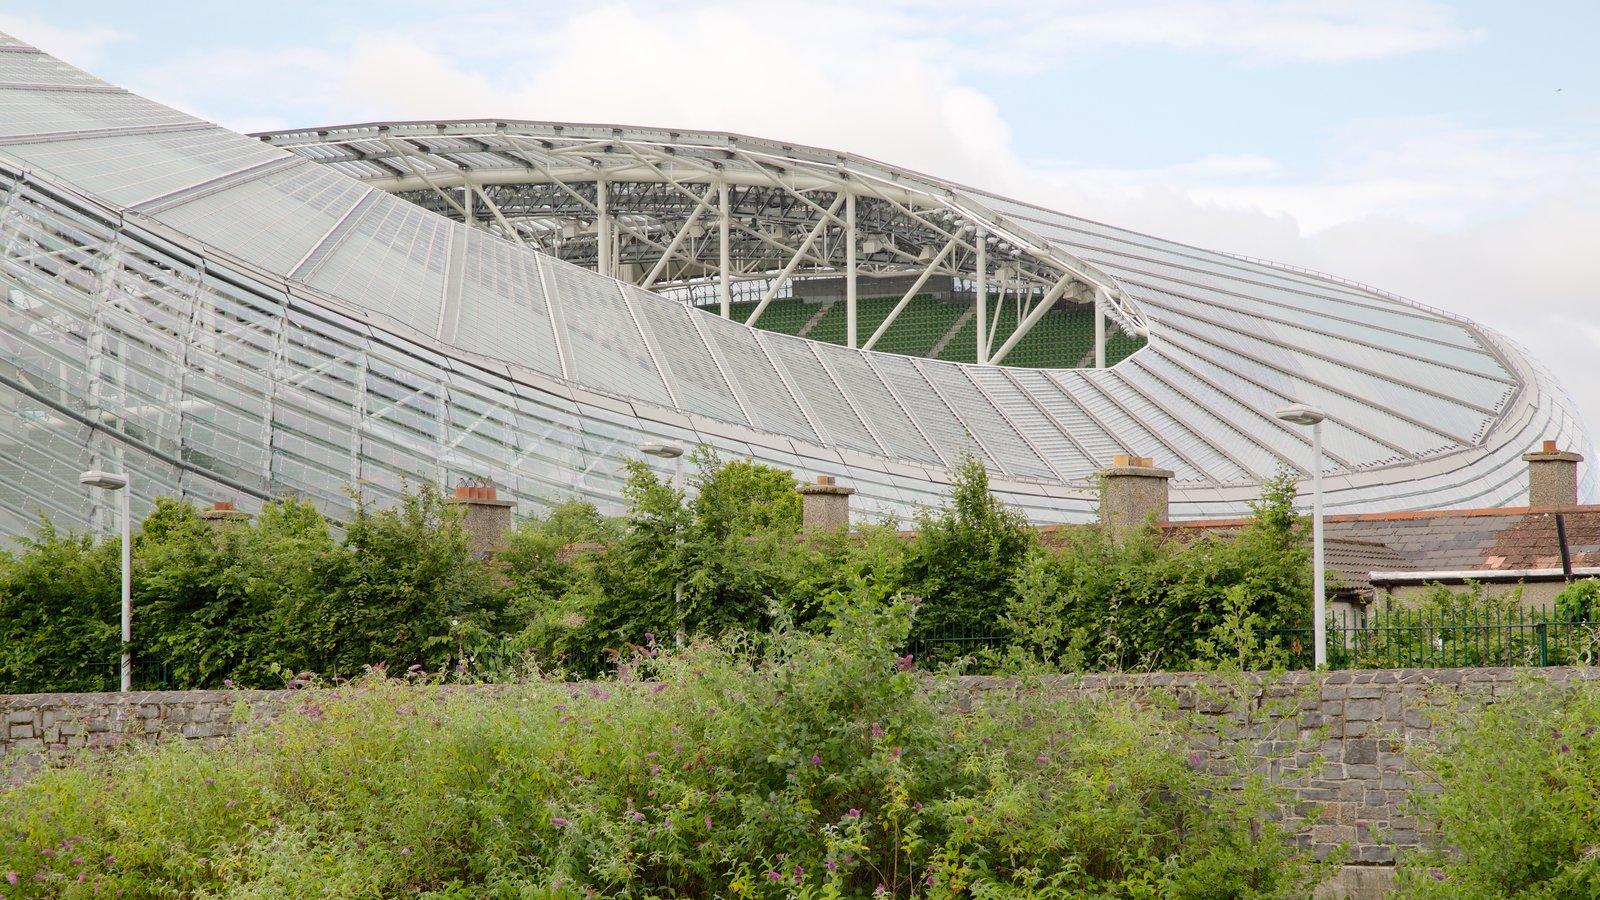 Estadio Aviva que incluye patrimonio de arquitectura y arquitectura moderna